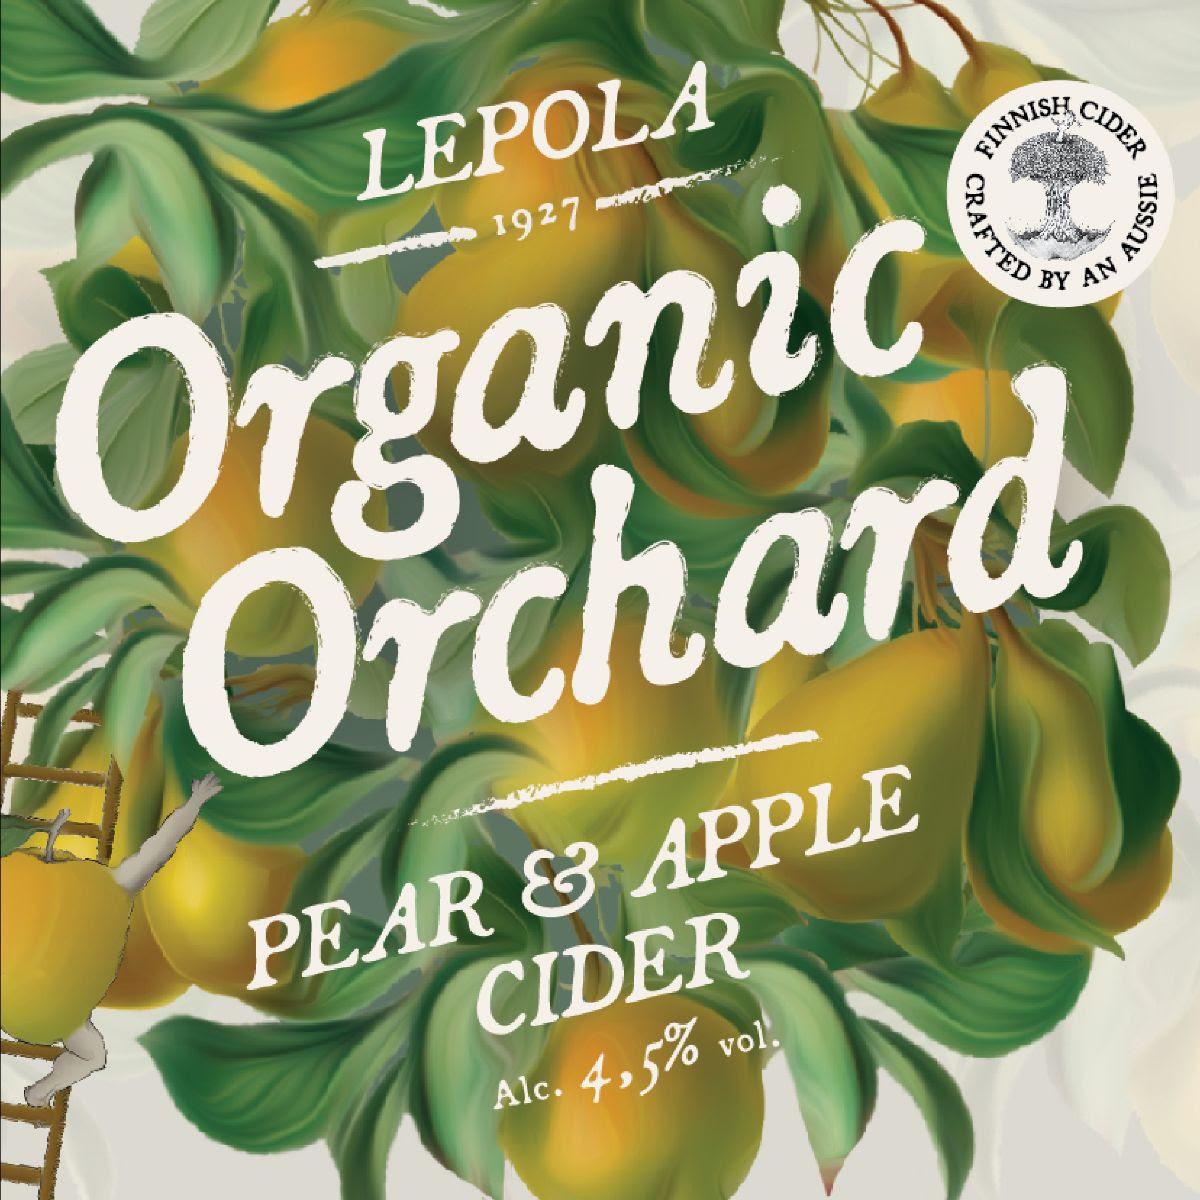 Lepola Organic Pear & Apple Cider 5,5% - 0,33l bottle